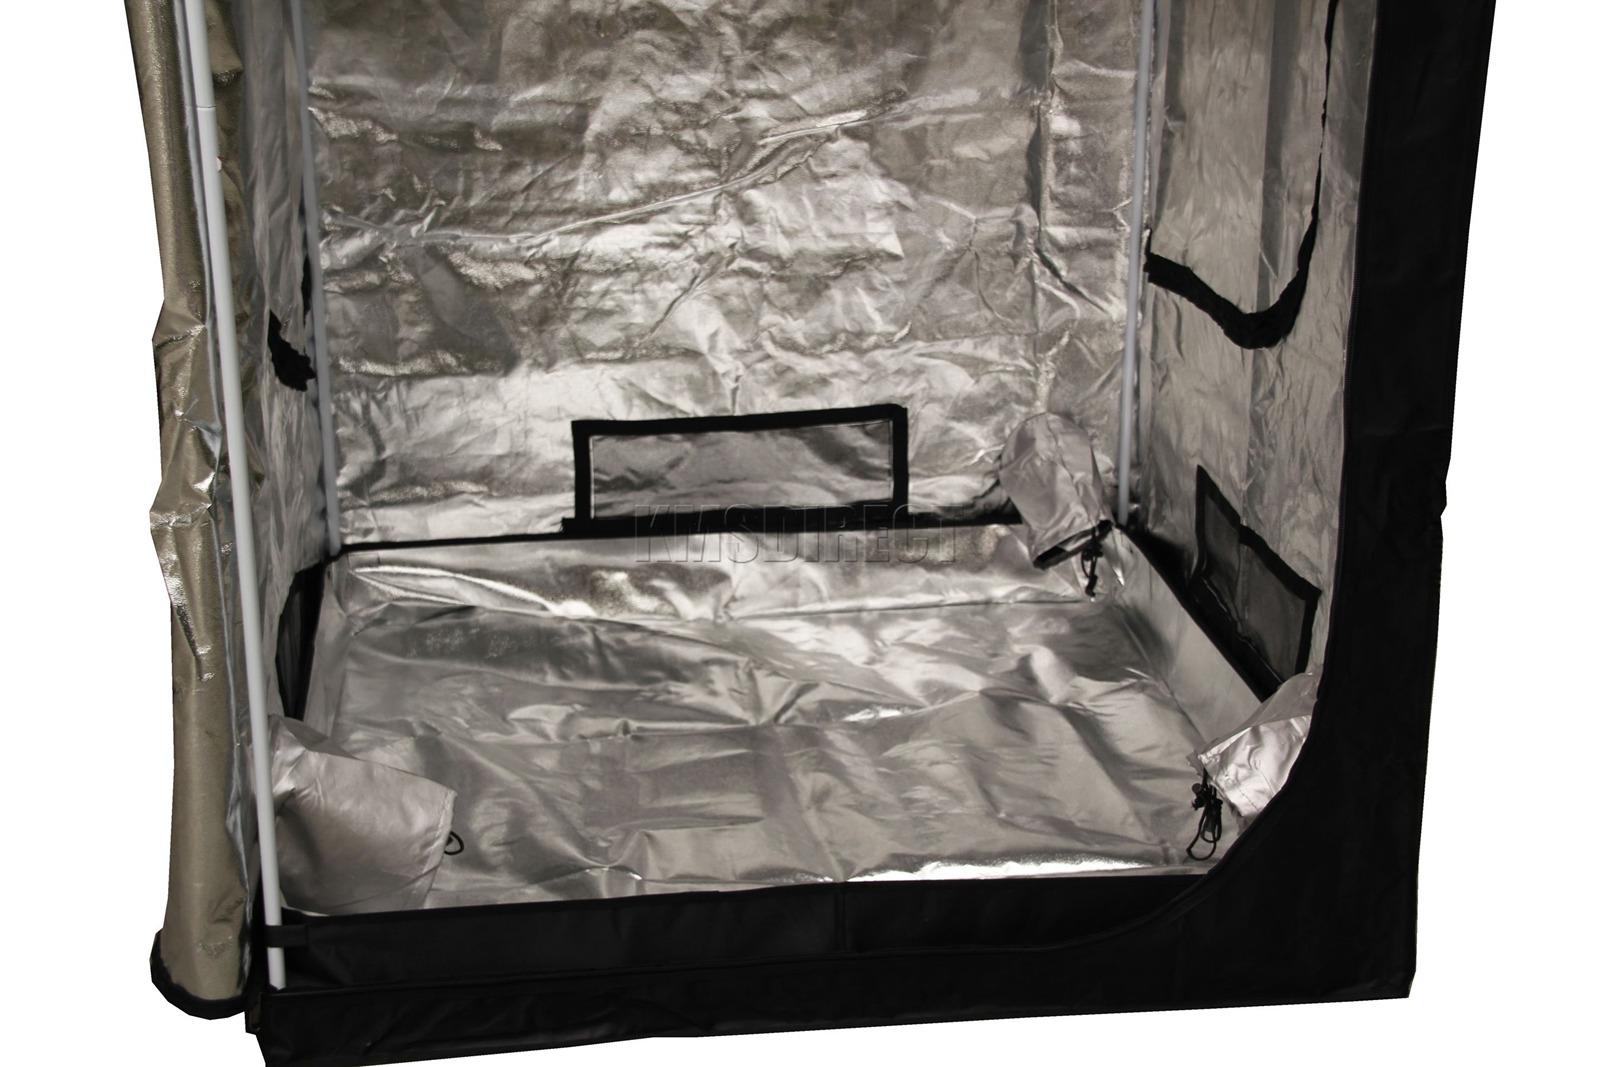 Indoor-Portable-Grow-Tent-Box-Silver-Mylar-Hydroponics-Bud-Green-Room-New-Design miniatuur 16